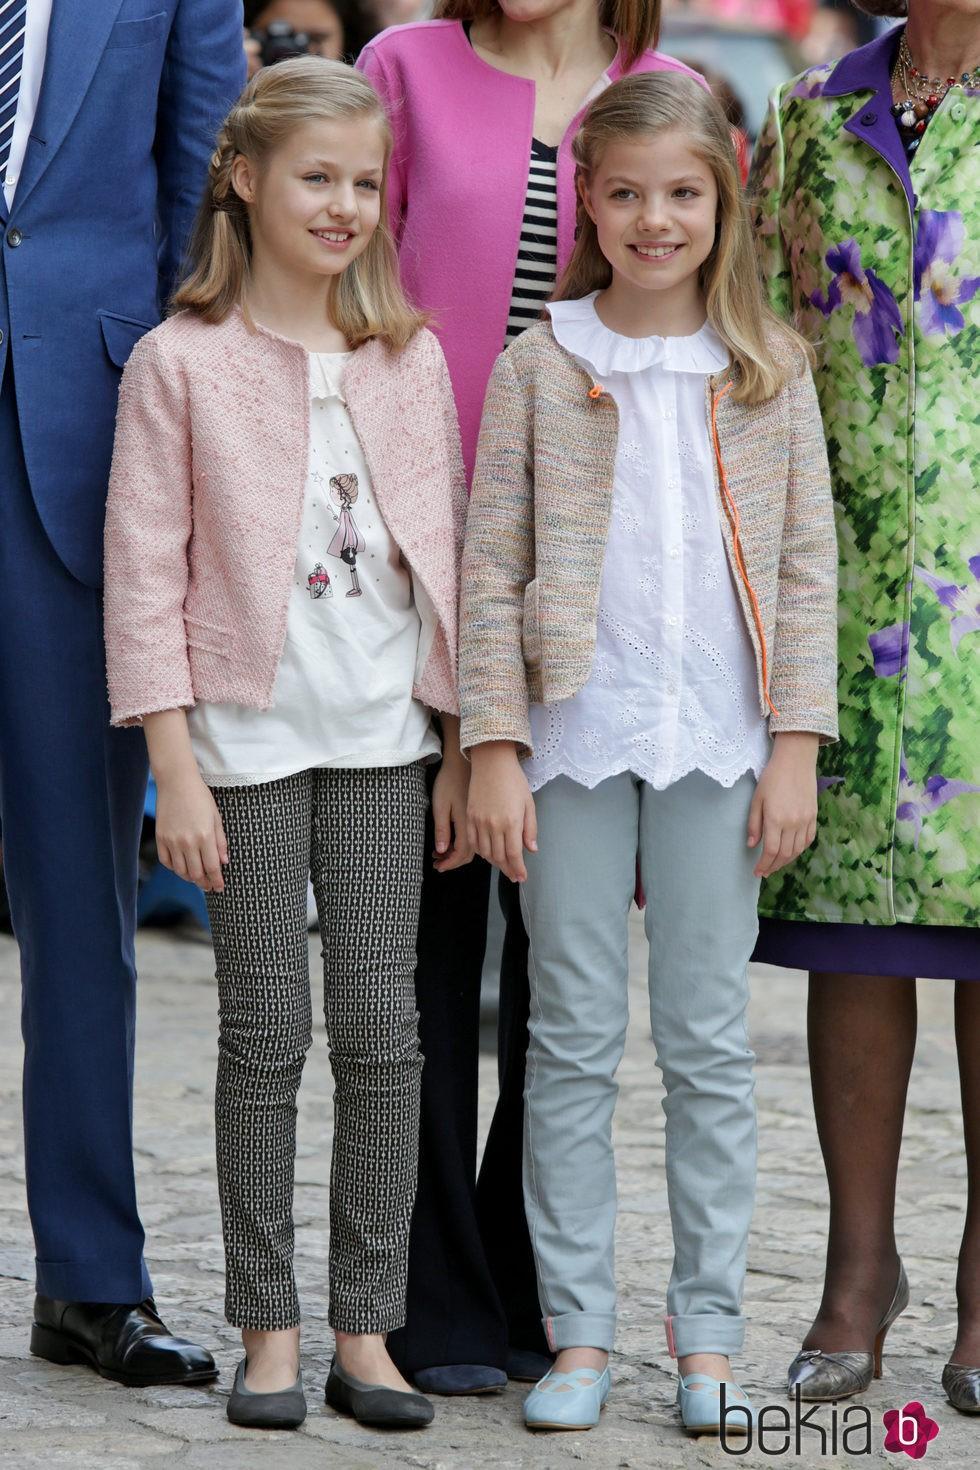 La Princesa Leonor y la Infanta Sofa en la Misa de Pascua